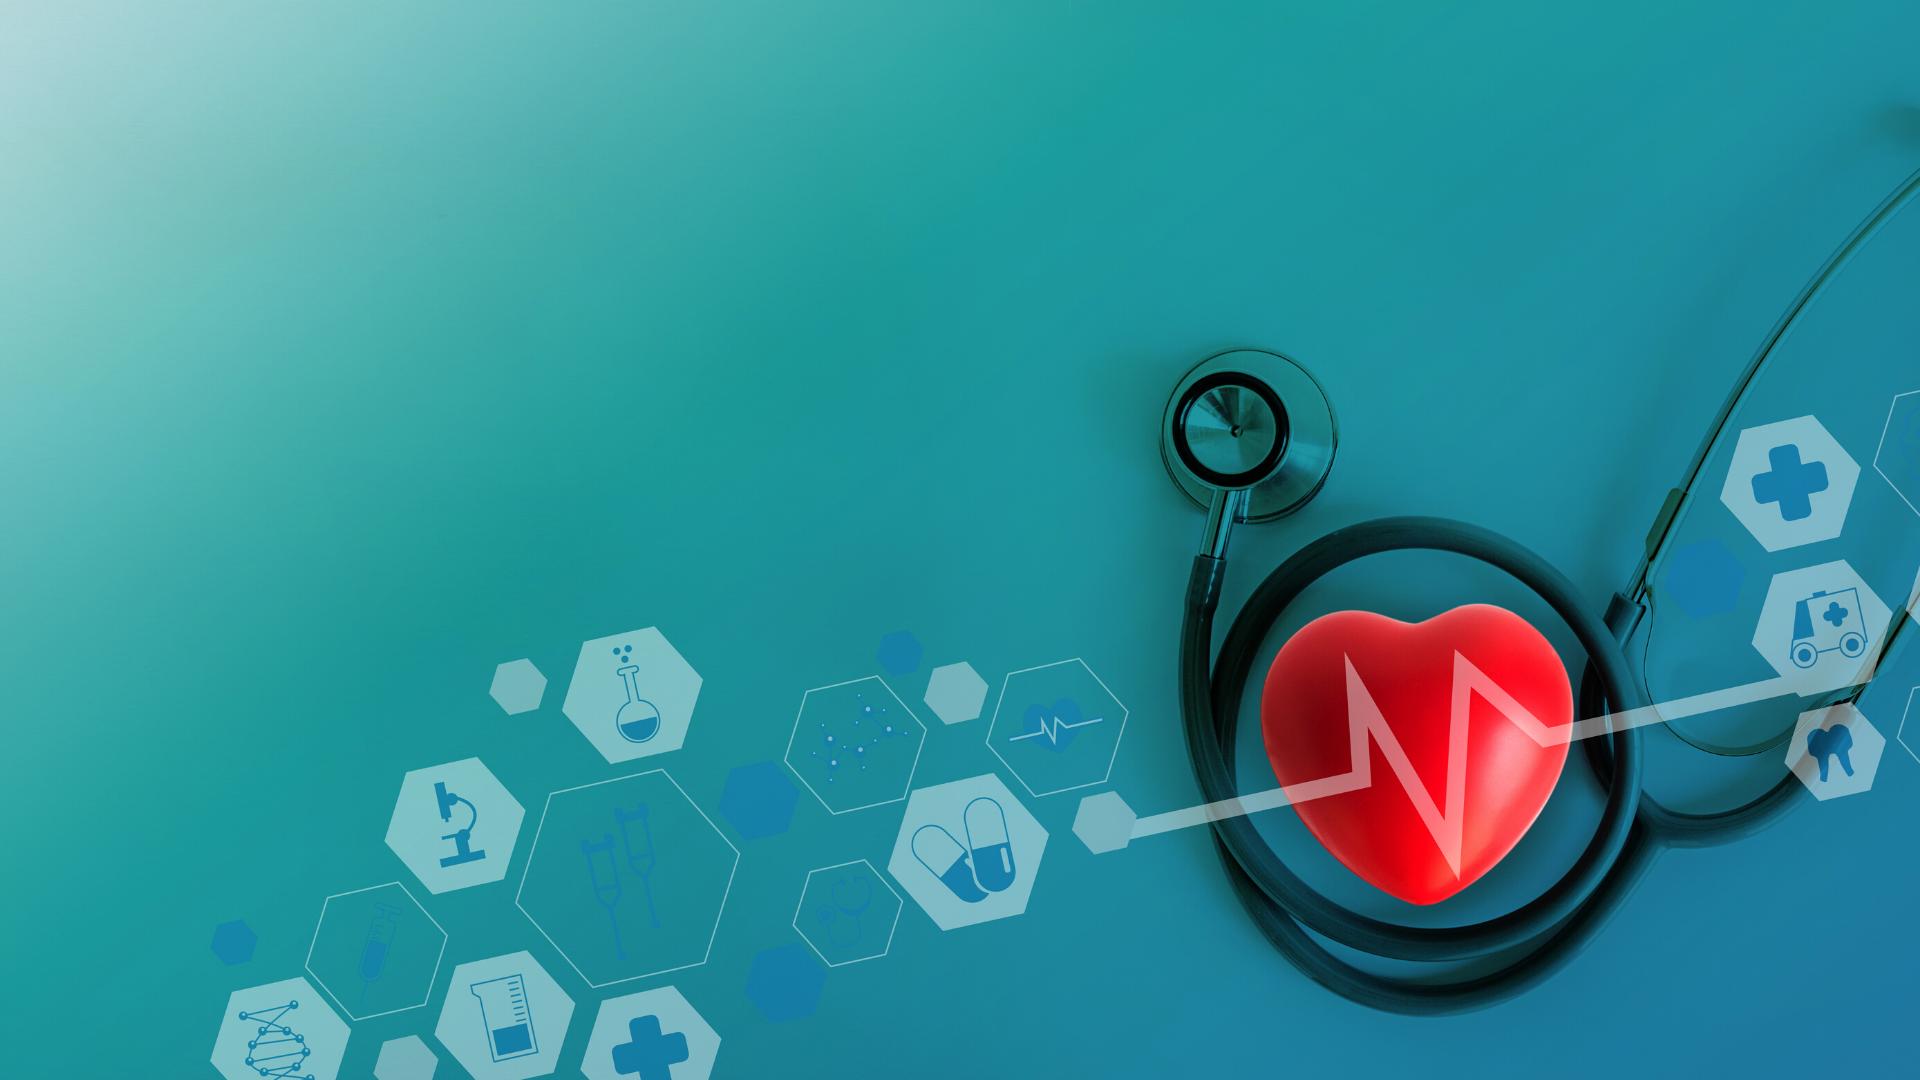 bigdata health